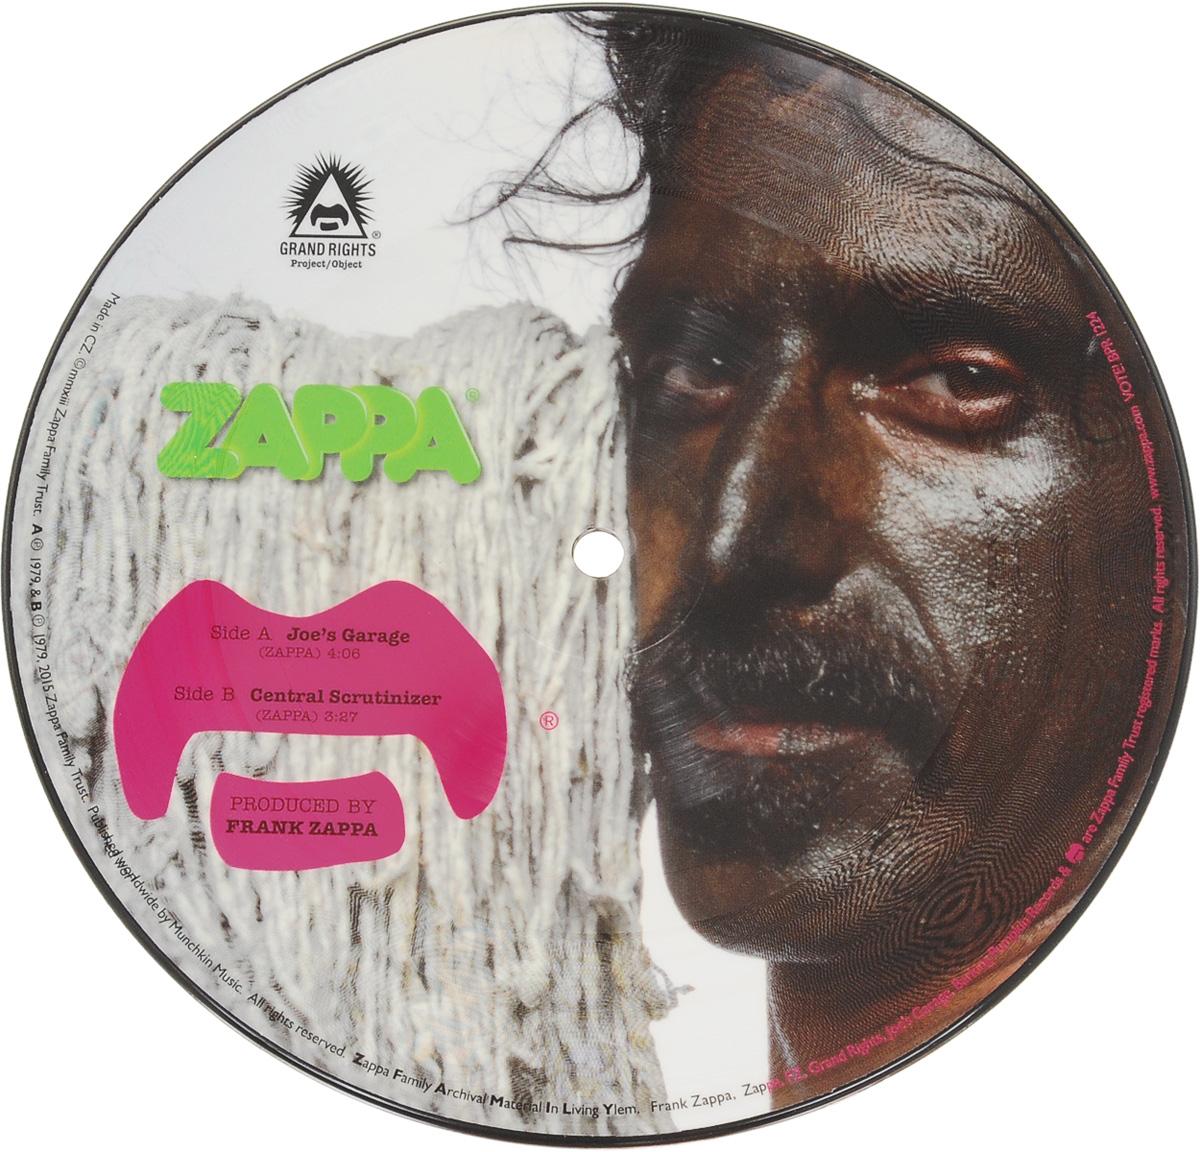 Фото - Фрэнк Заппа Frank Zappa. From Joe's Garage Acts 1, 2 & 3 (LP) frank zappa frank zappa joe s garage 3 lp